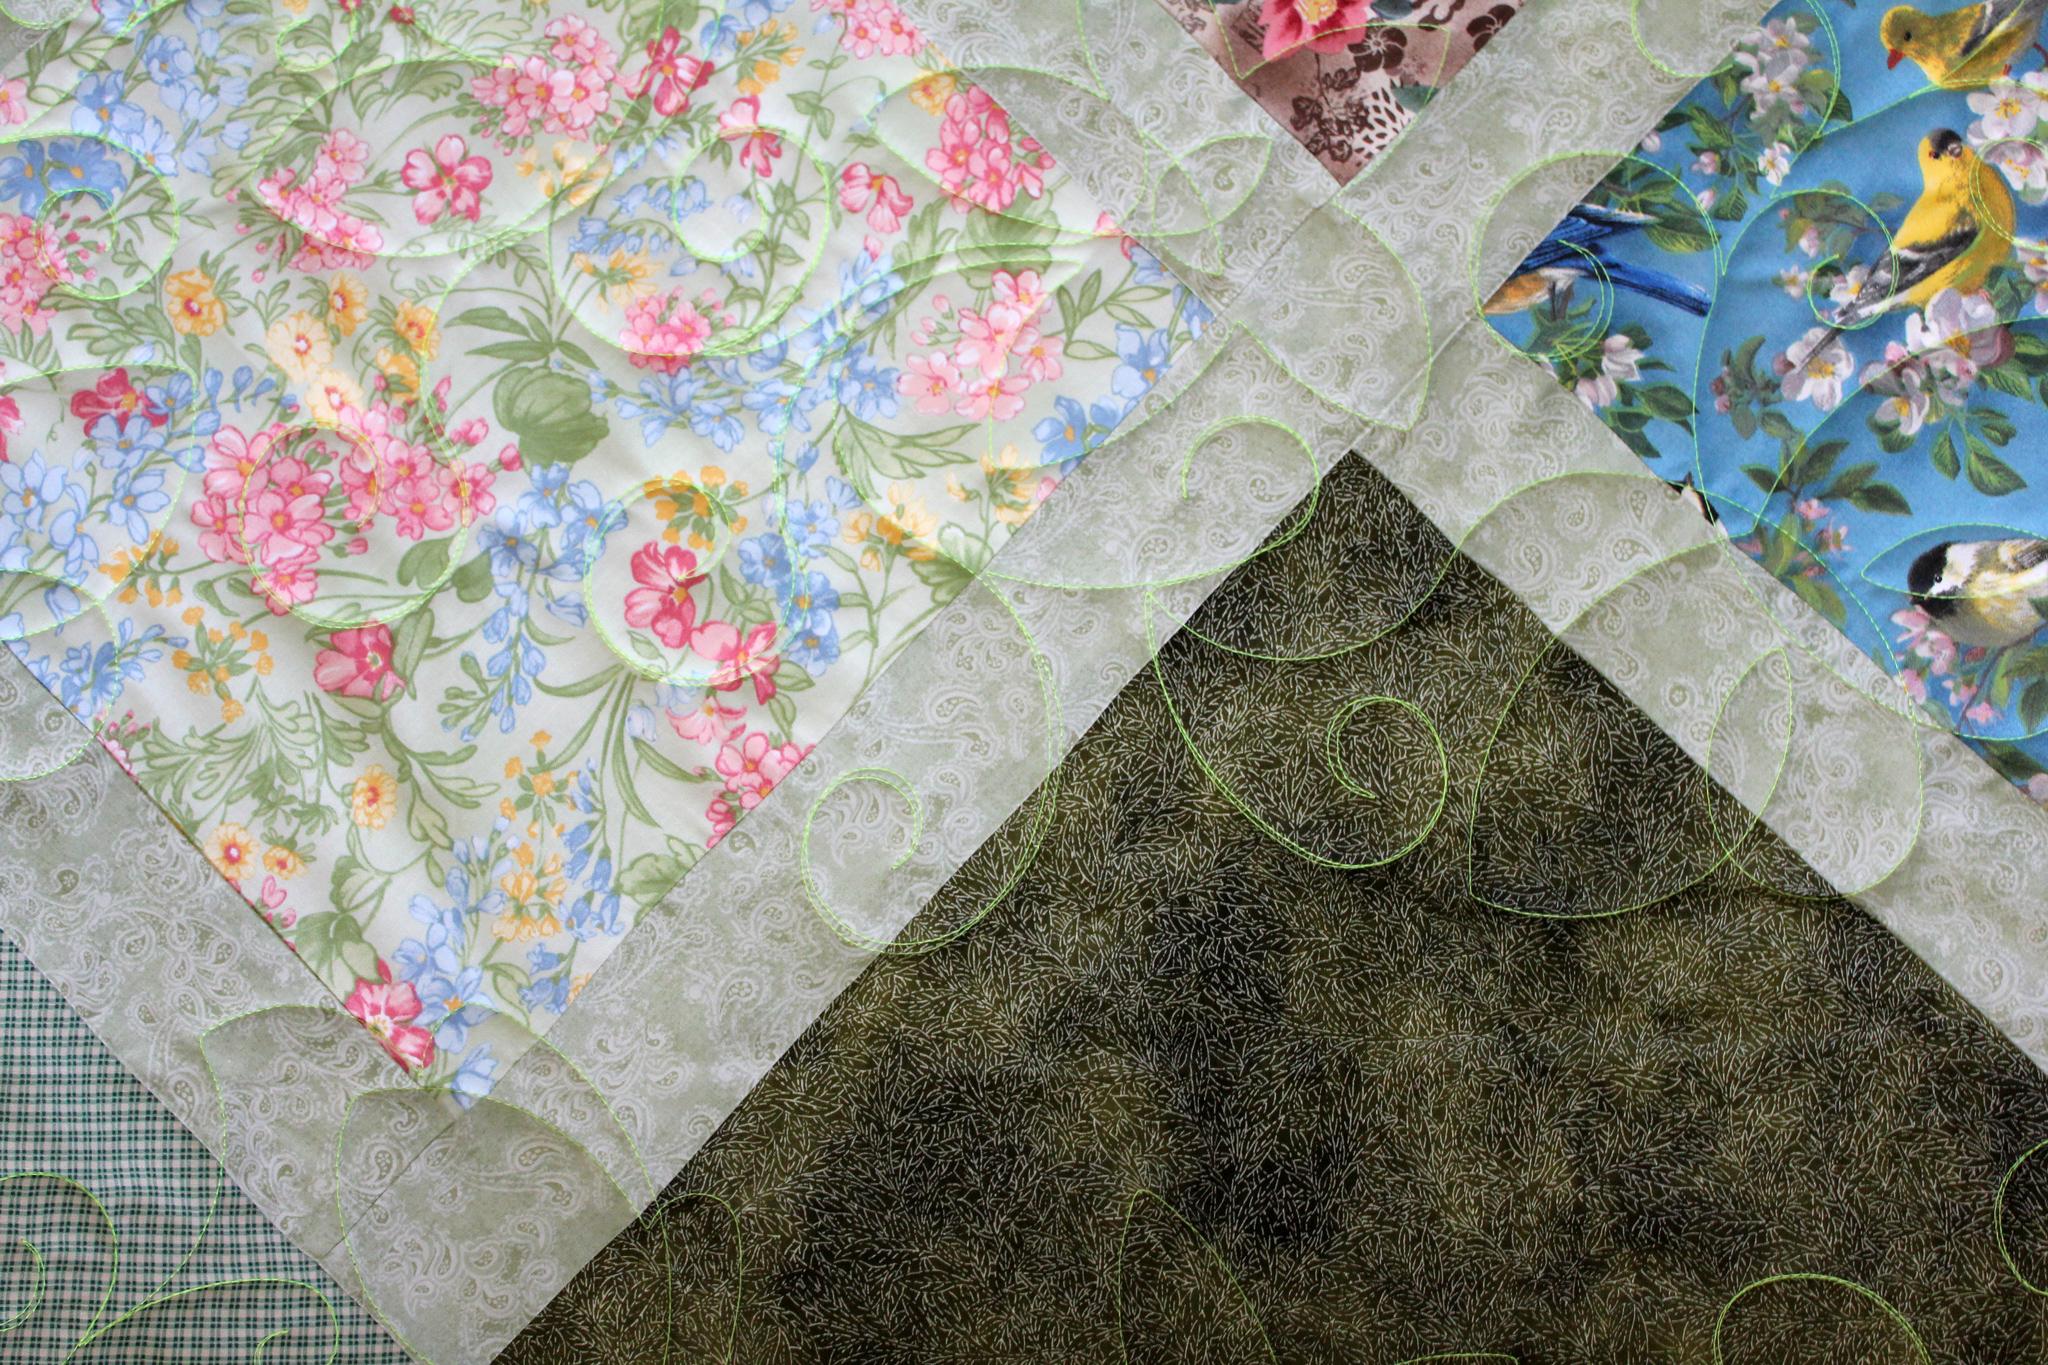 Mary's Flower Garden Quilt